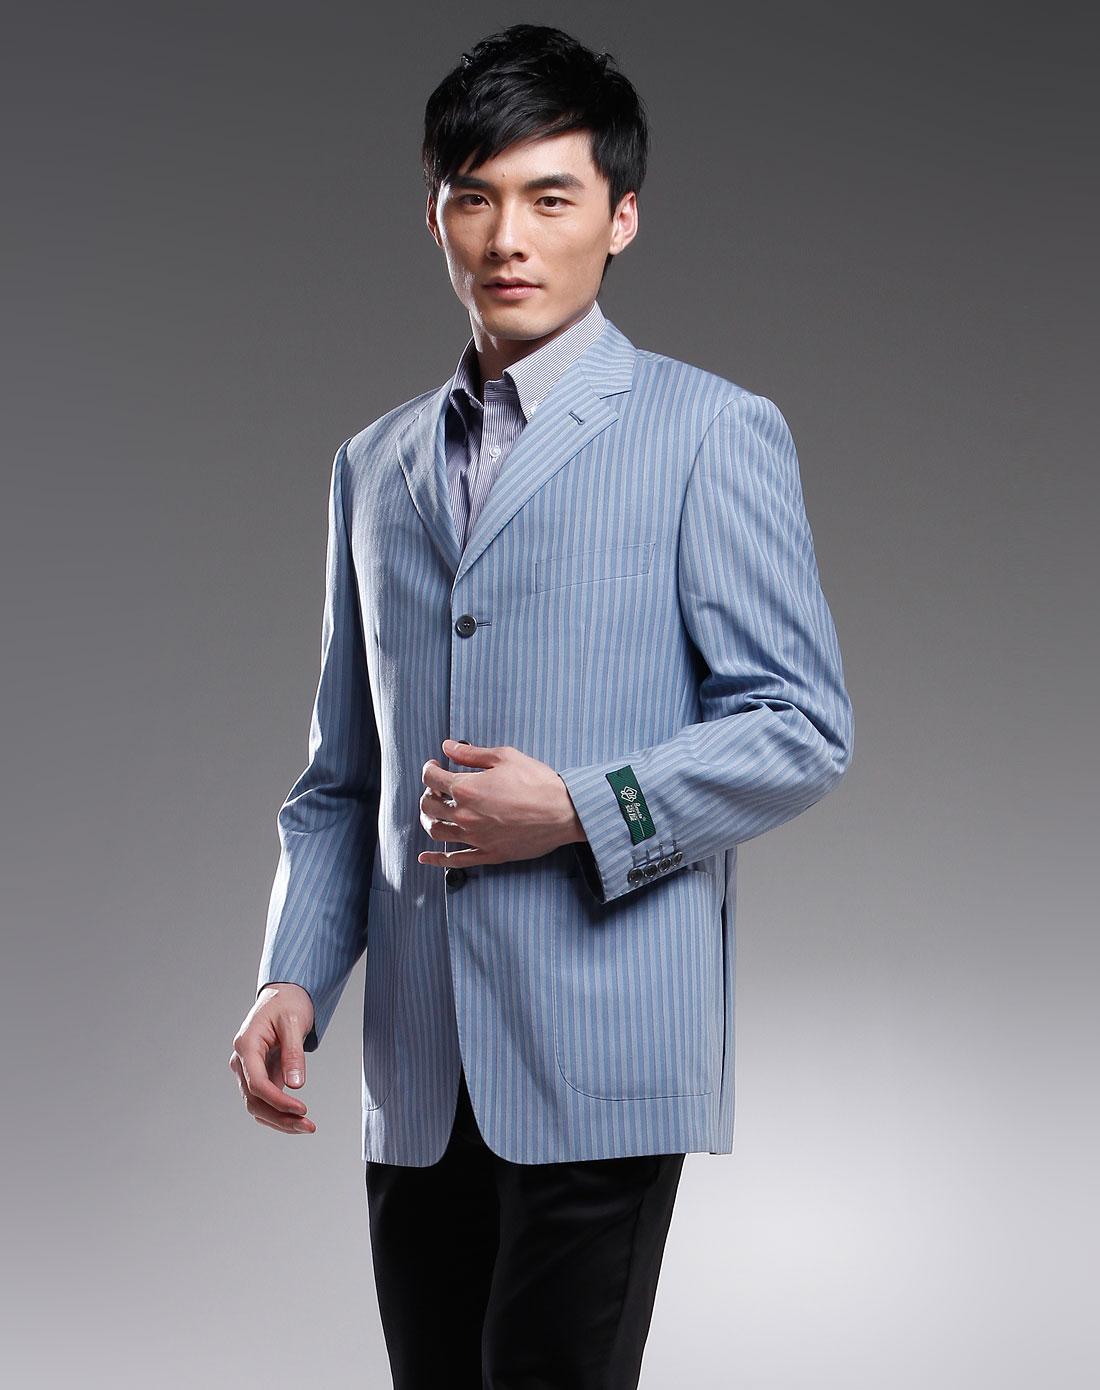 benato蓝色翻领粗条纹时尚长袖西服b174b016000